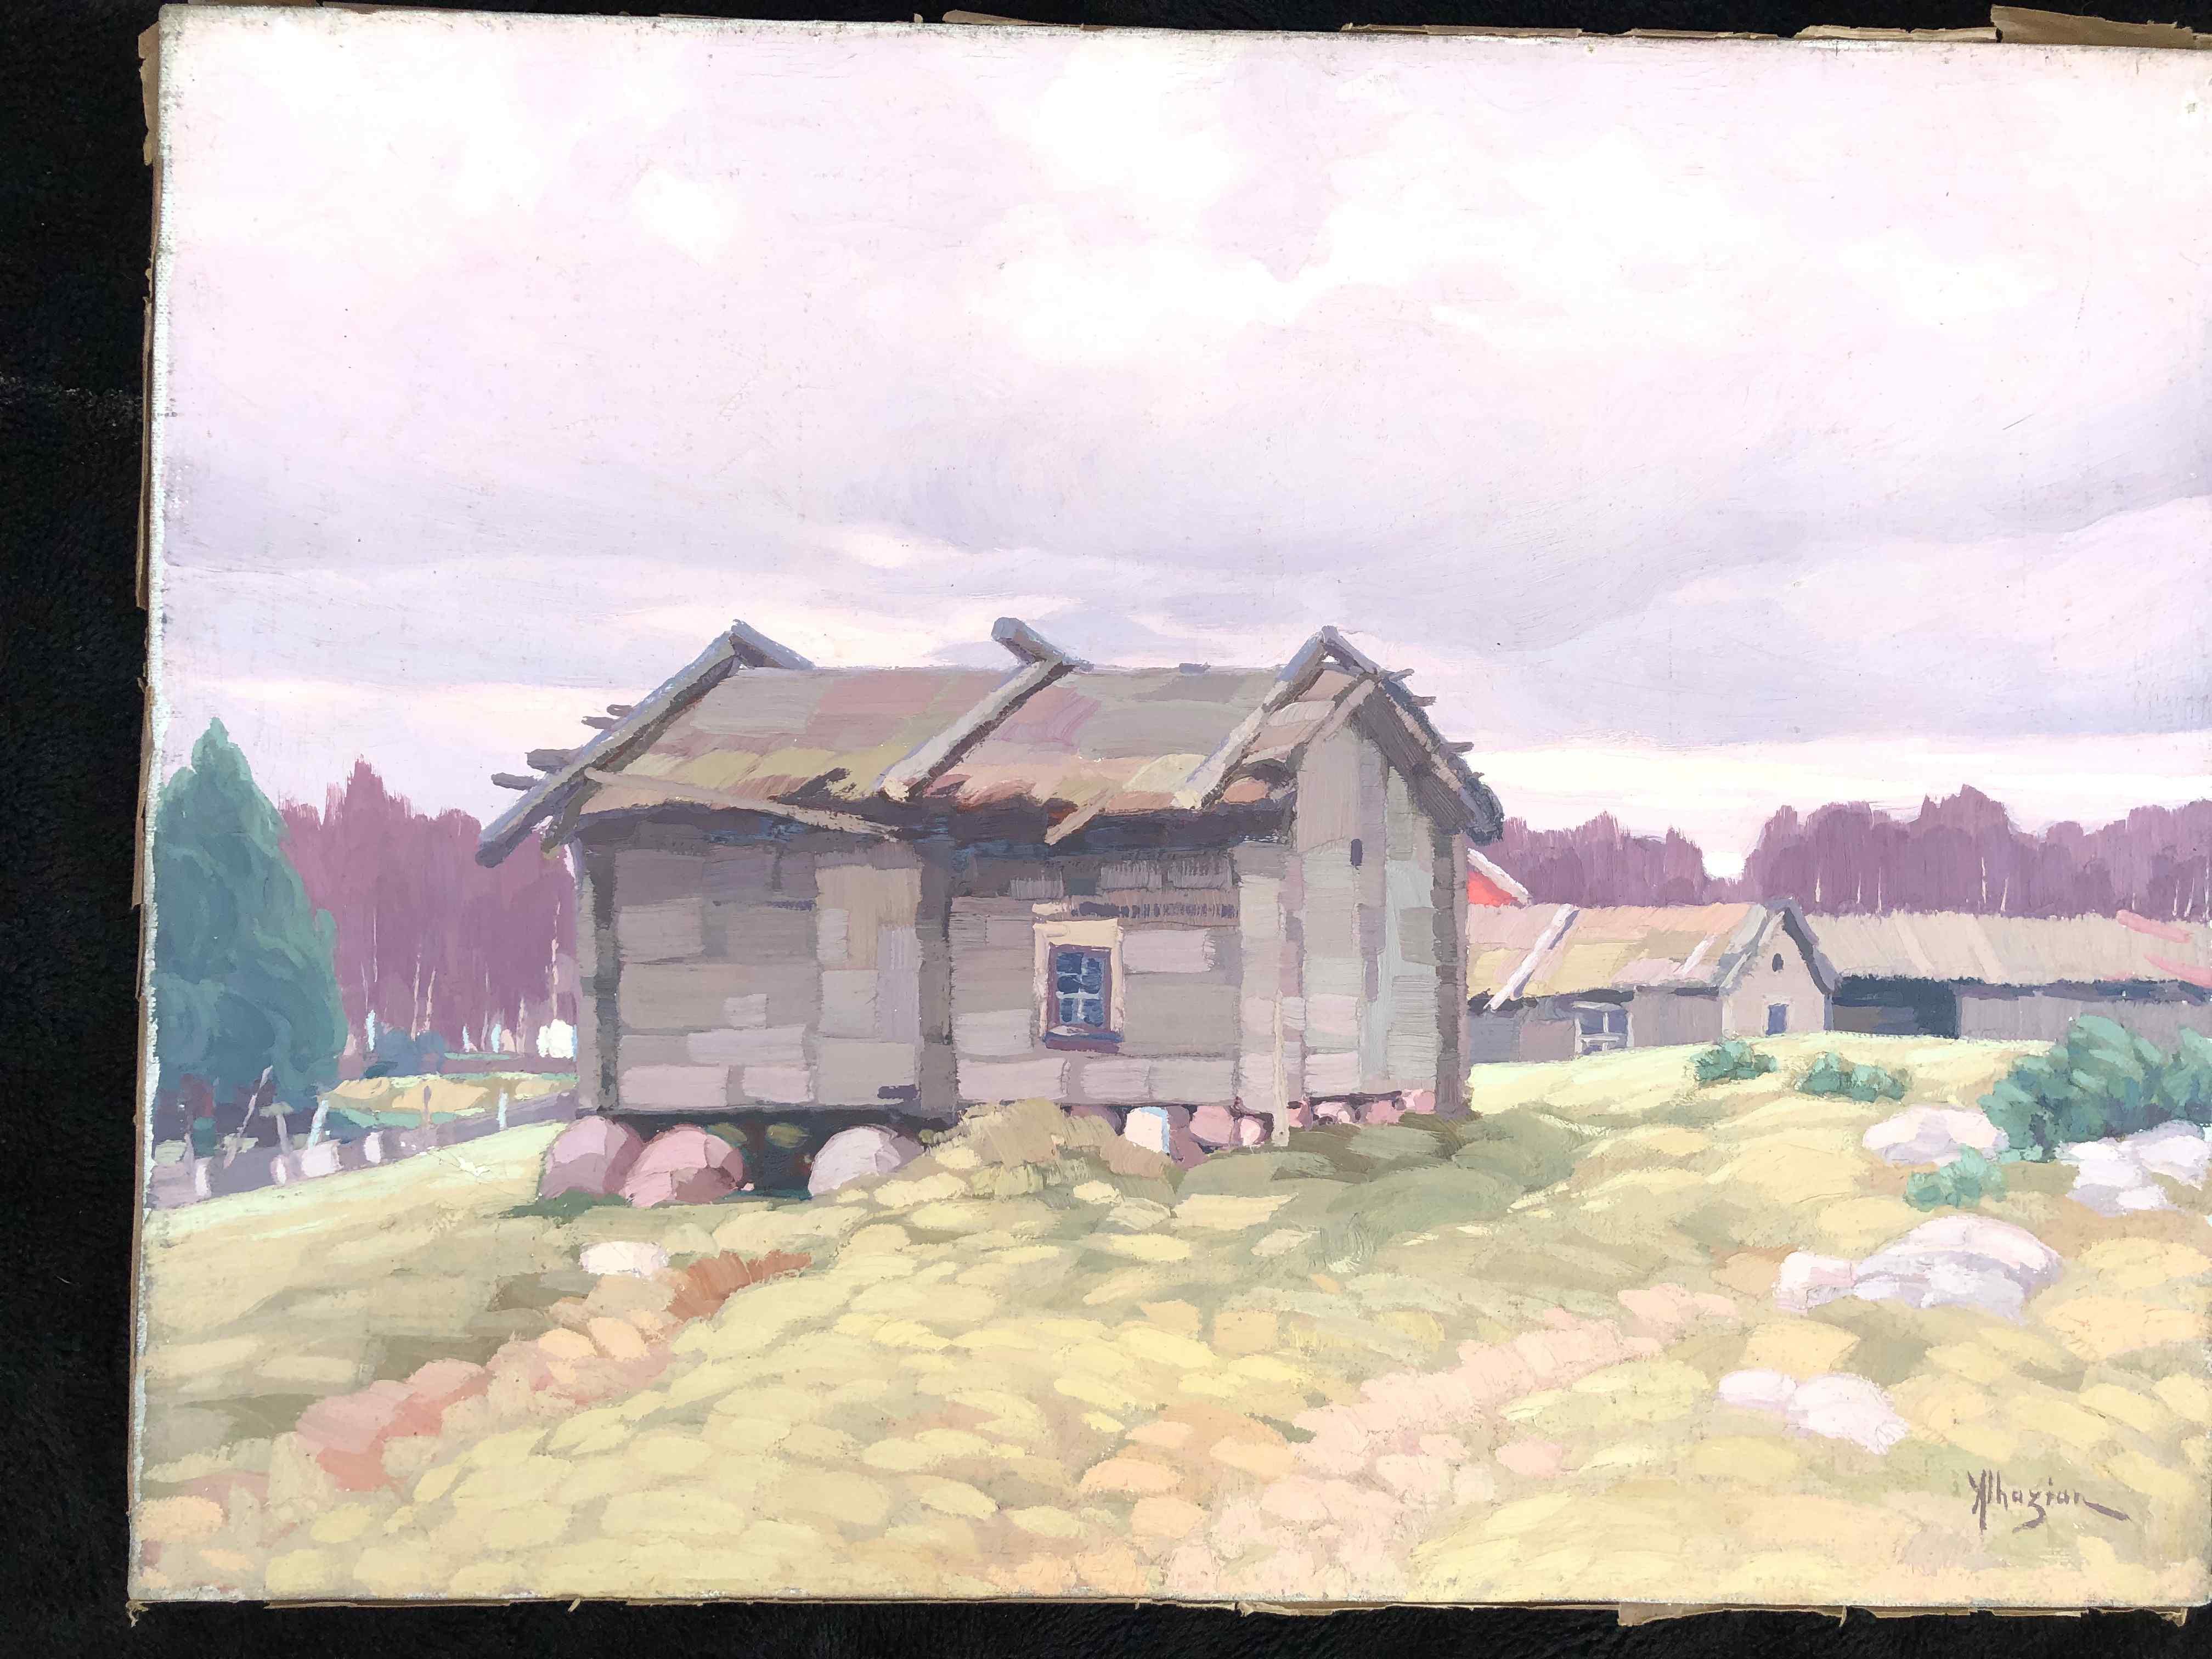 Ohnnès Alhazian (1881-1958) pittore armeno